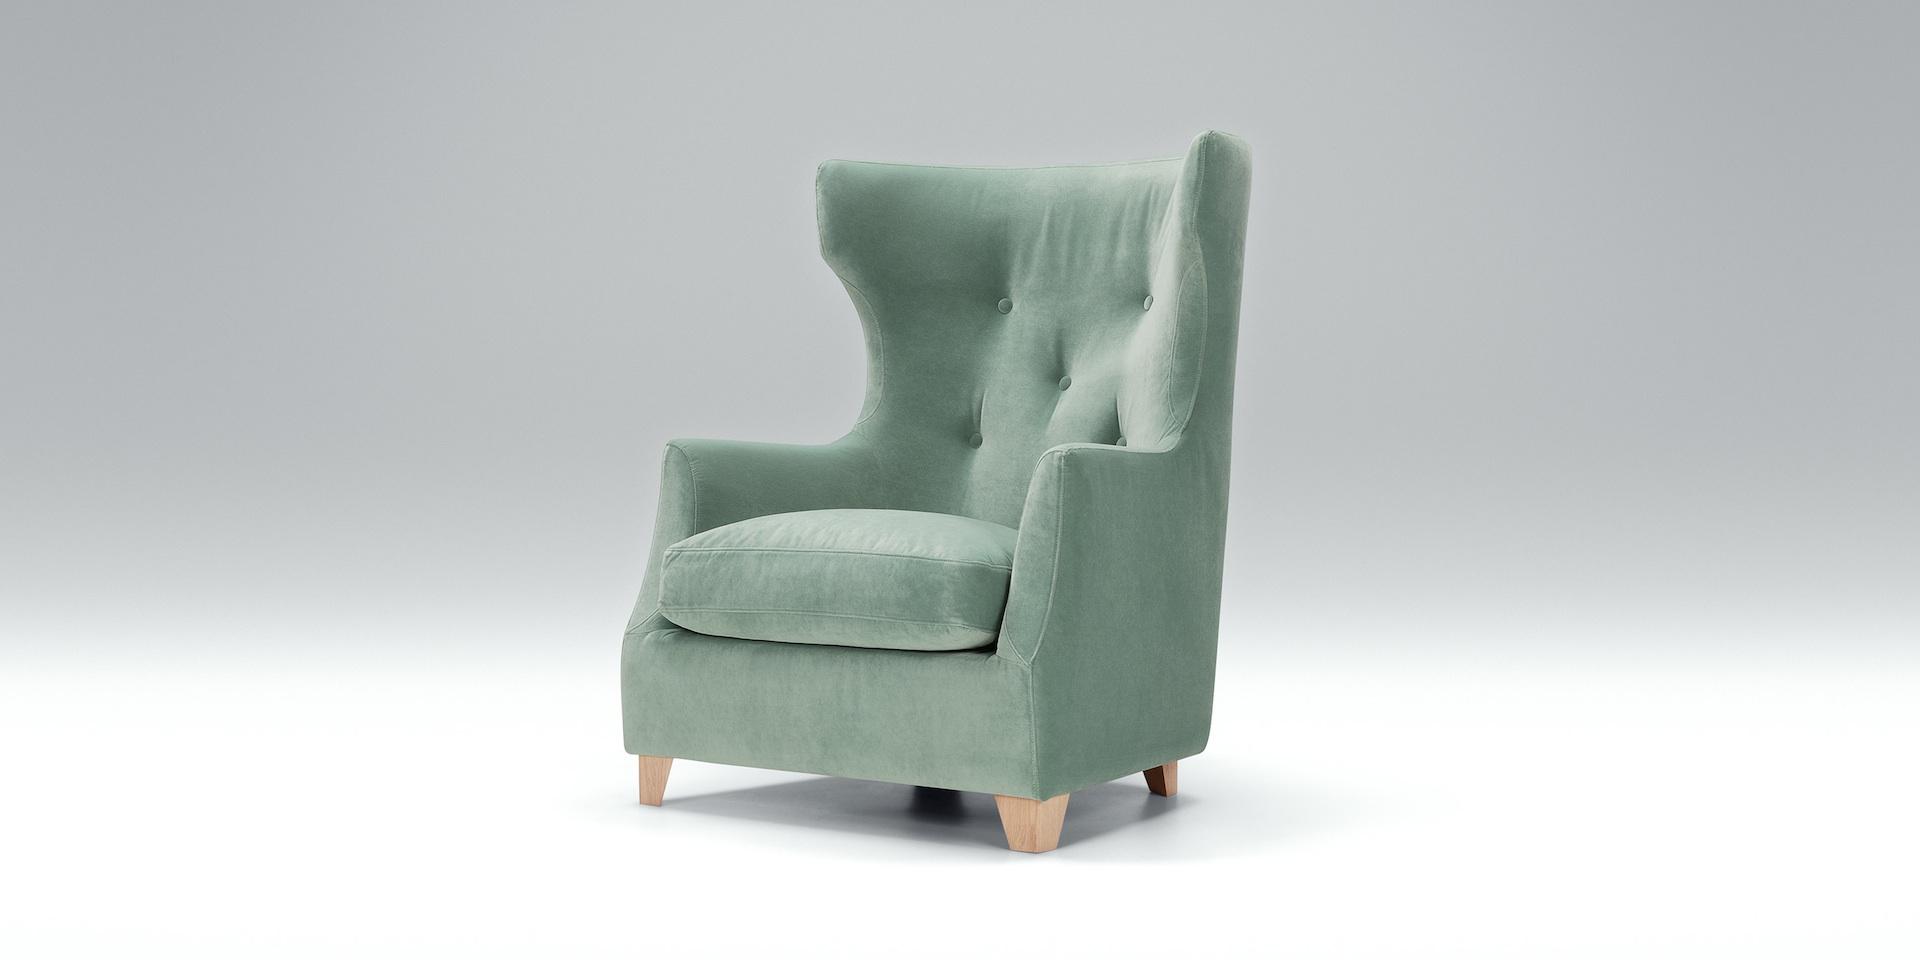 ROSE_shadow_armchair_high_classic_velvet13_light_turquoise_2